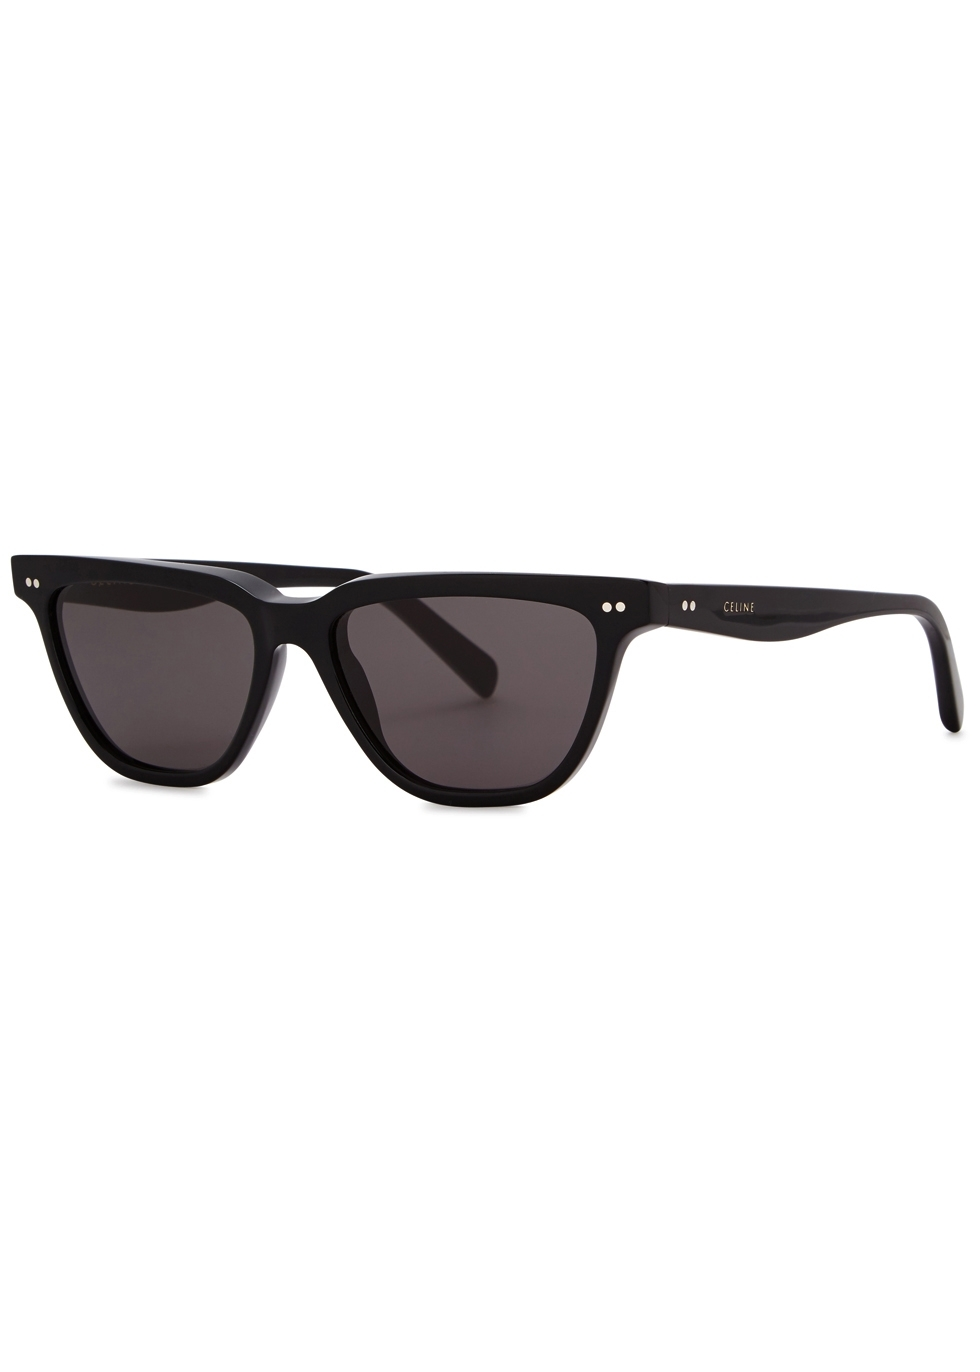 7037405ff14 Celine Sunglasses